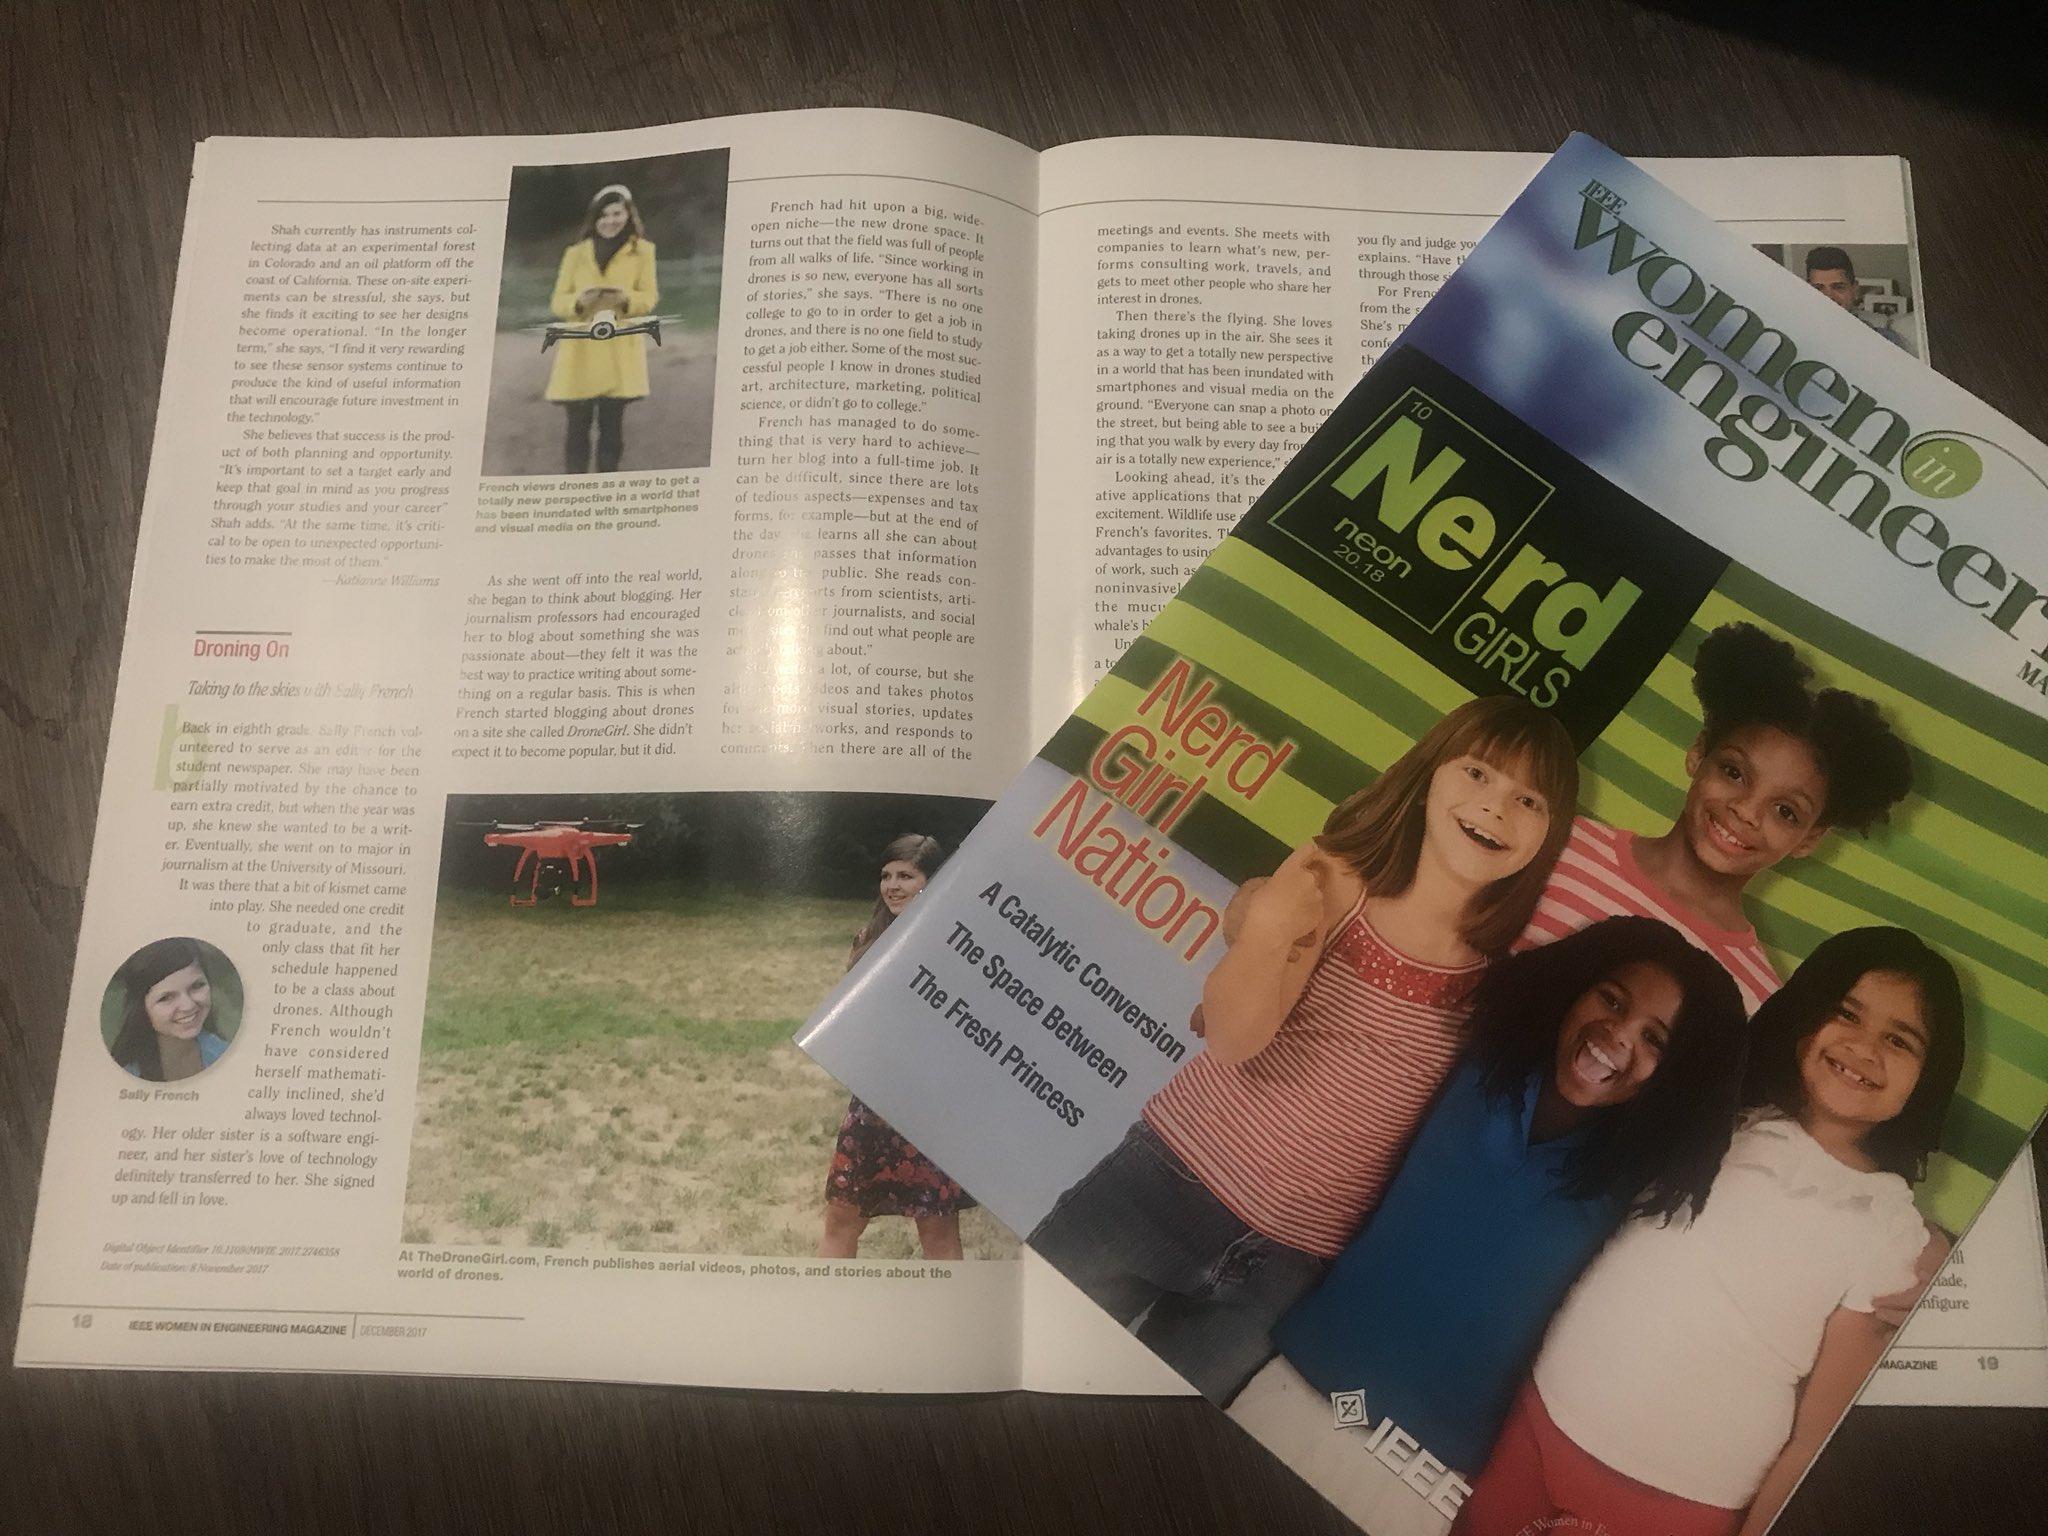 IEEE features The Drone Girl in Women in Engineering magazine